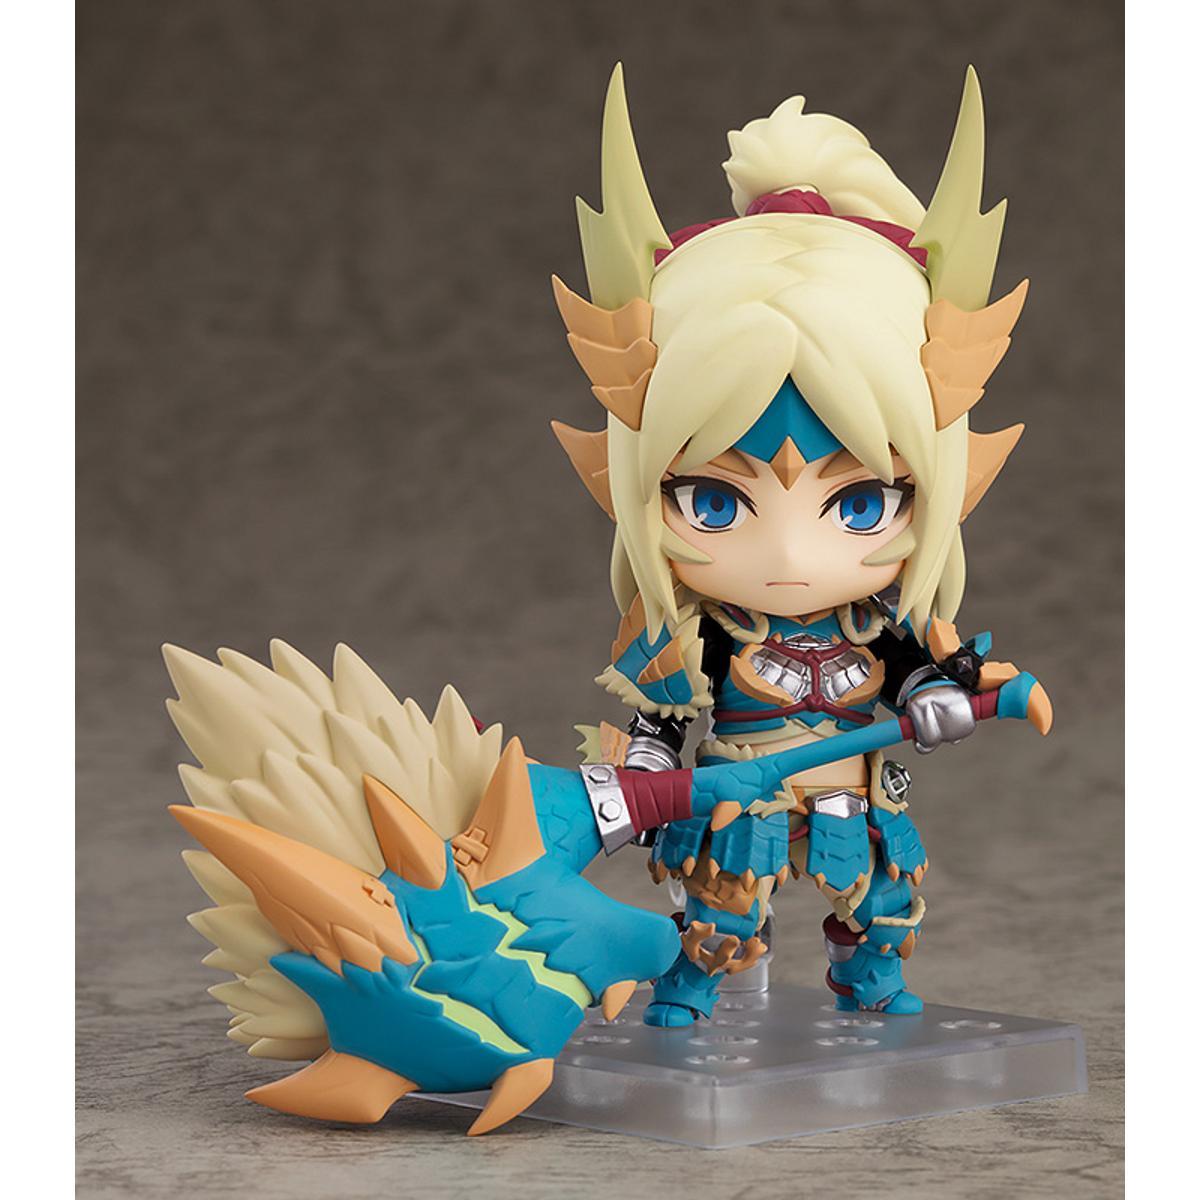 Nendoroid Hunter: Female Zinogre Alpha Armor Ver.